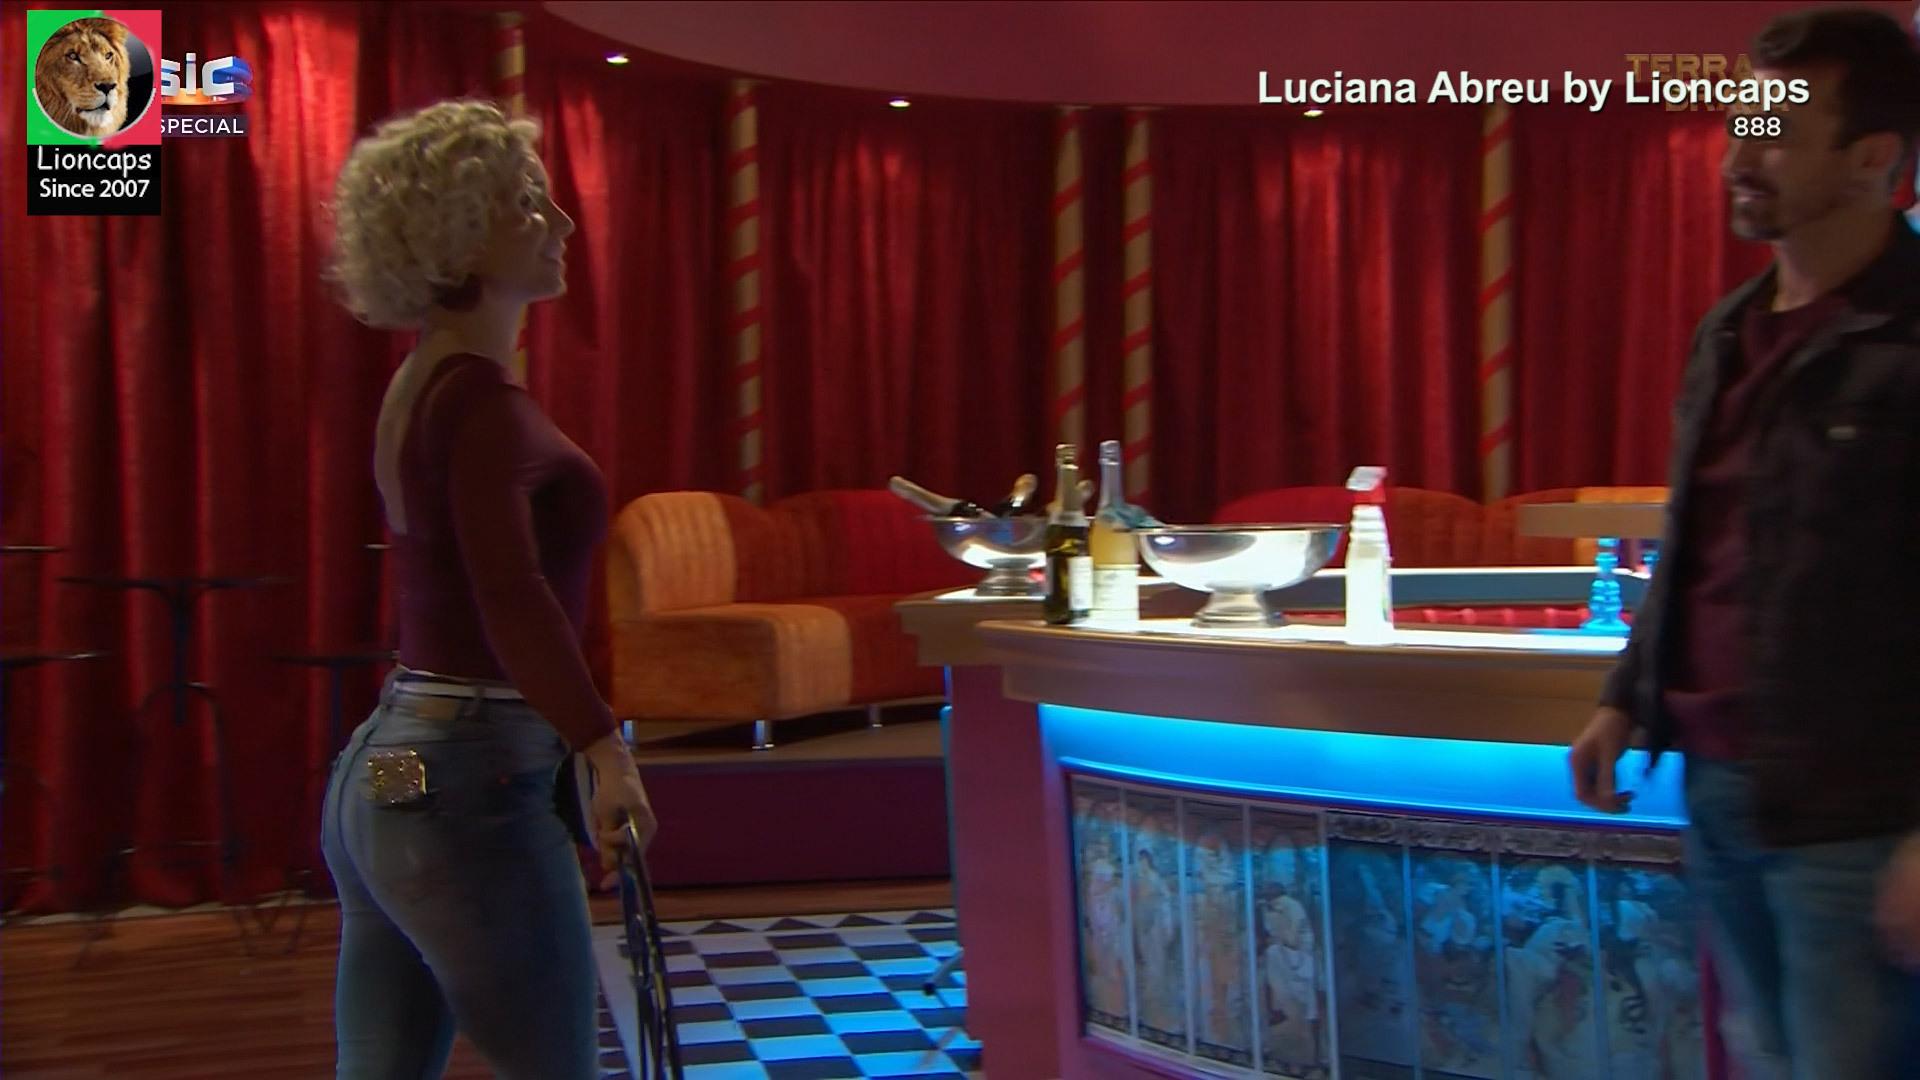 luciana_abreu_terra_brava_lioncaps_30_11_2020_03 (8).jpg